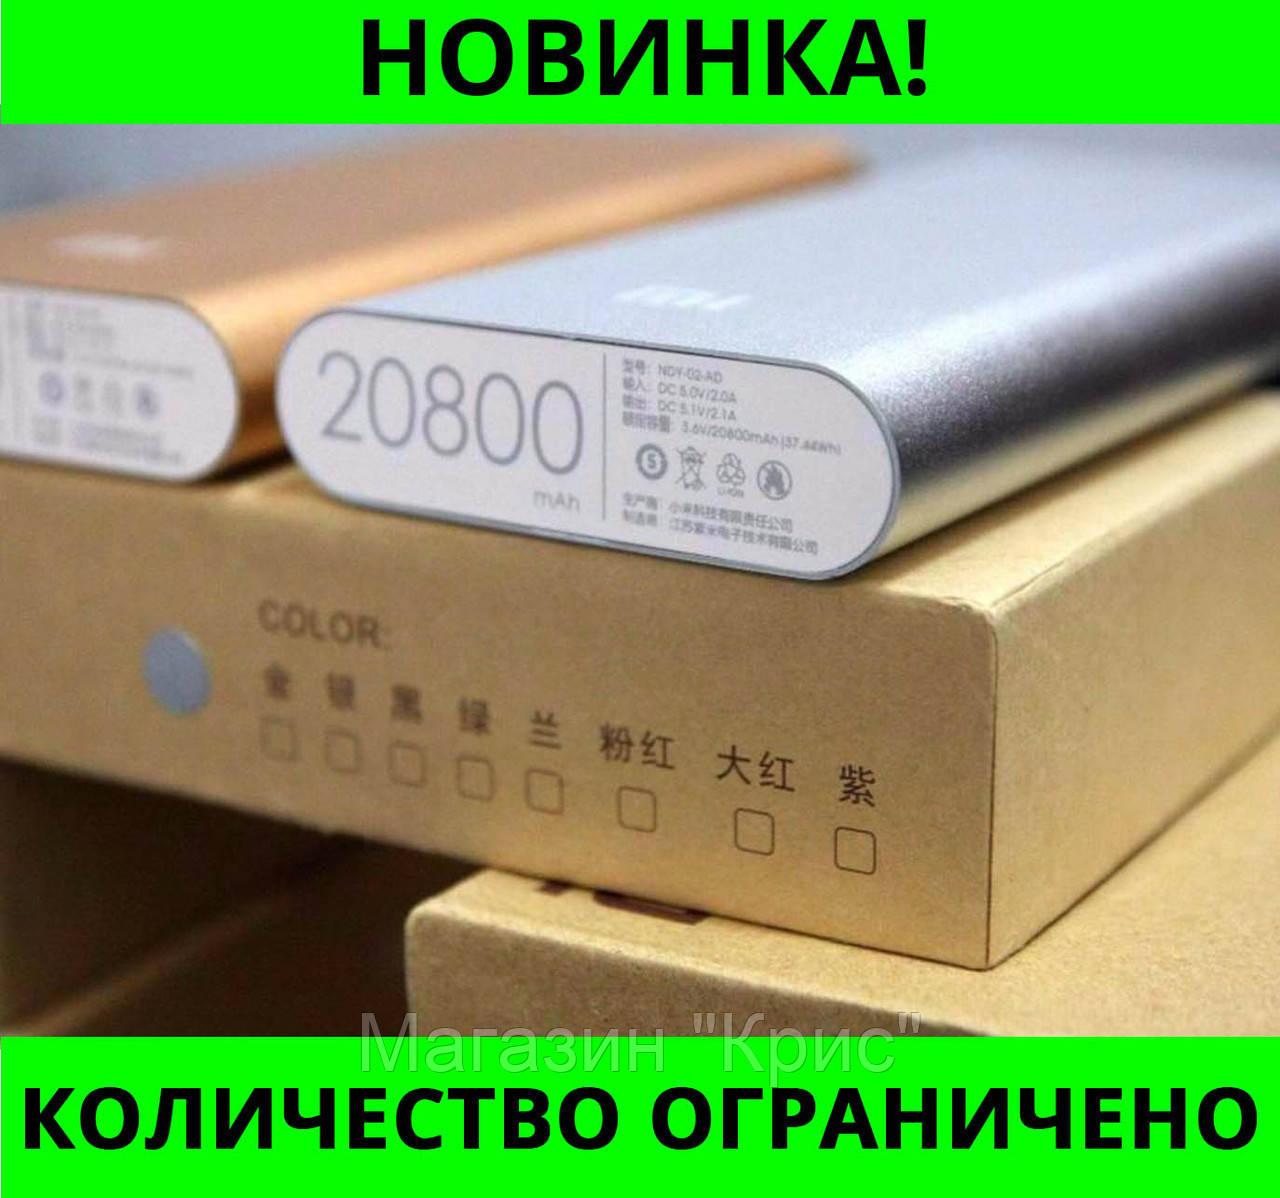 Хiaomi Power Bank 20800 mAh, павербанк, зарядка, зарядное устройство! Распродажа